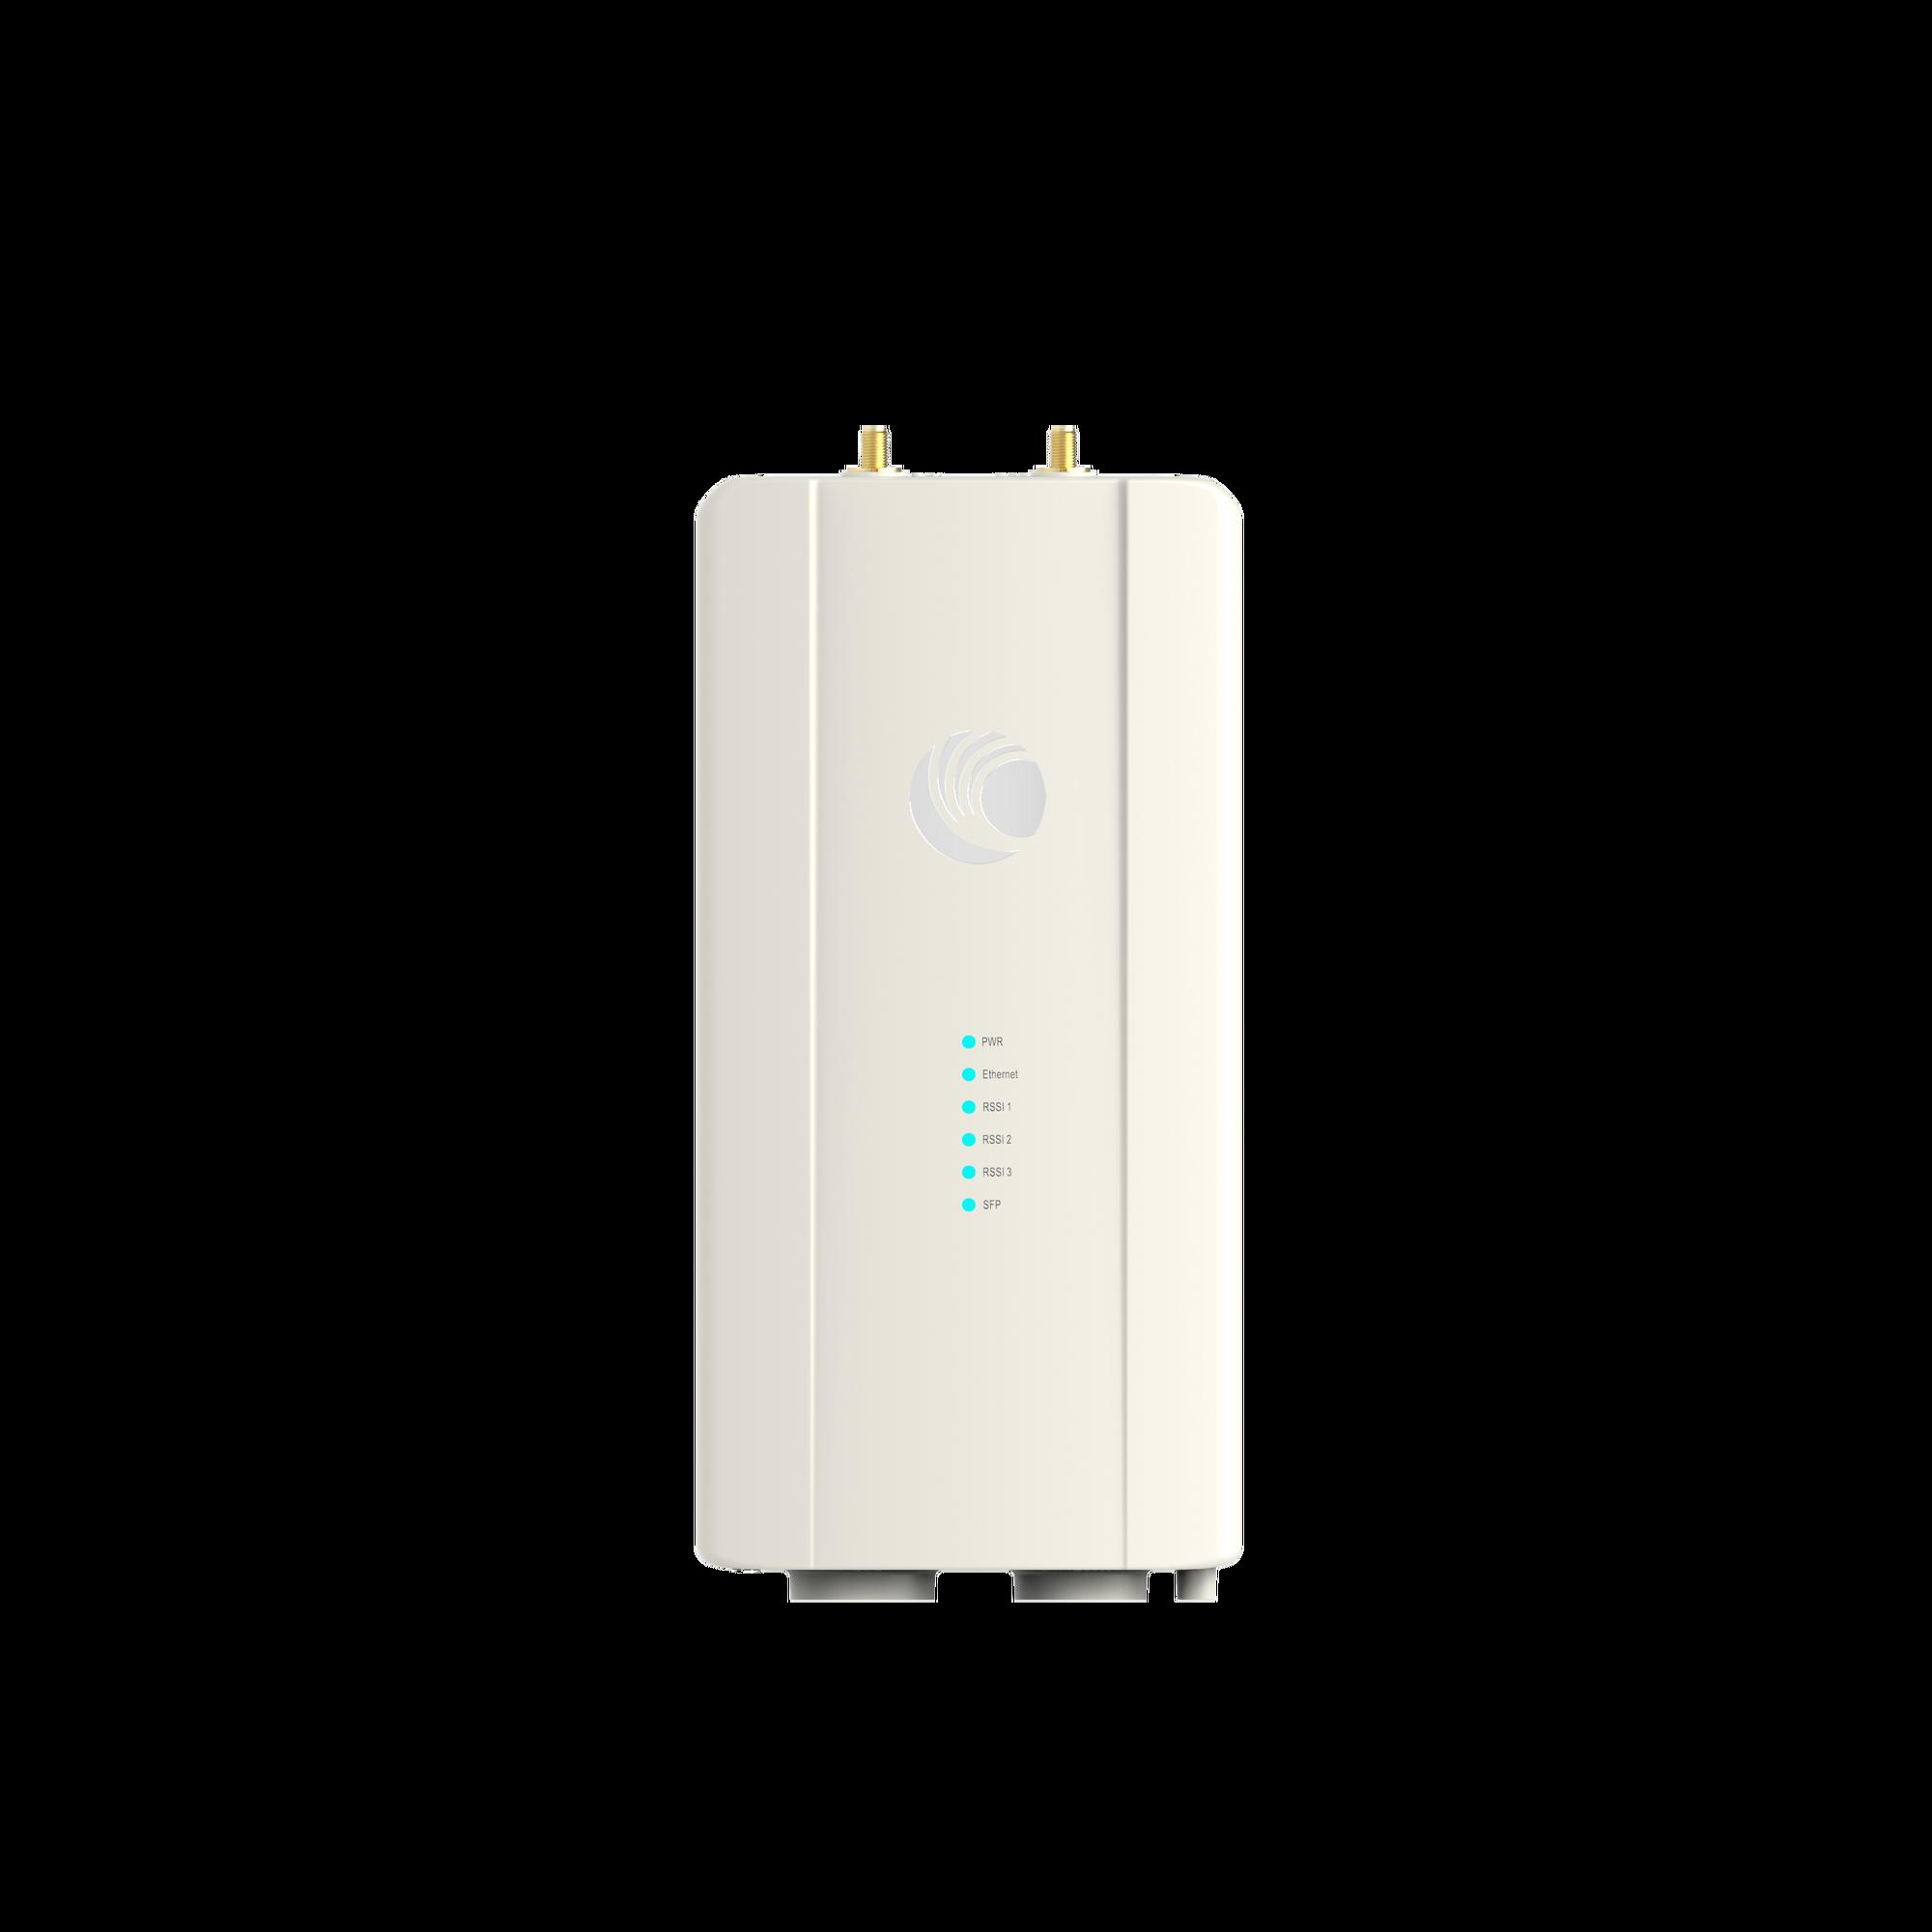 Radio para enlace BackHaul ePMP Force 400C conectorizado, protocoló 802.11ax, 4.9-6.2 GHz, IP67, hasta 1 Gbps, puerto SFP